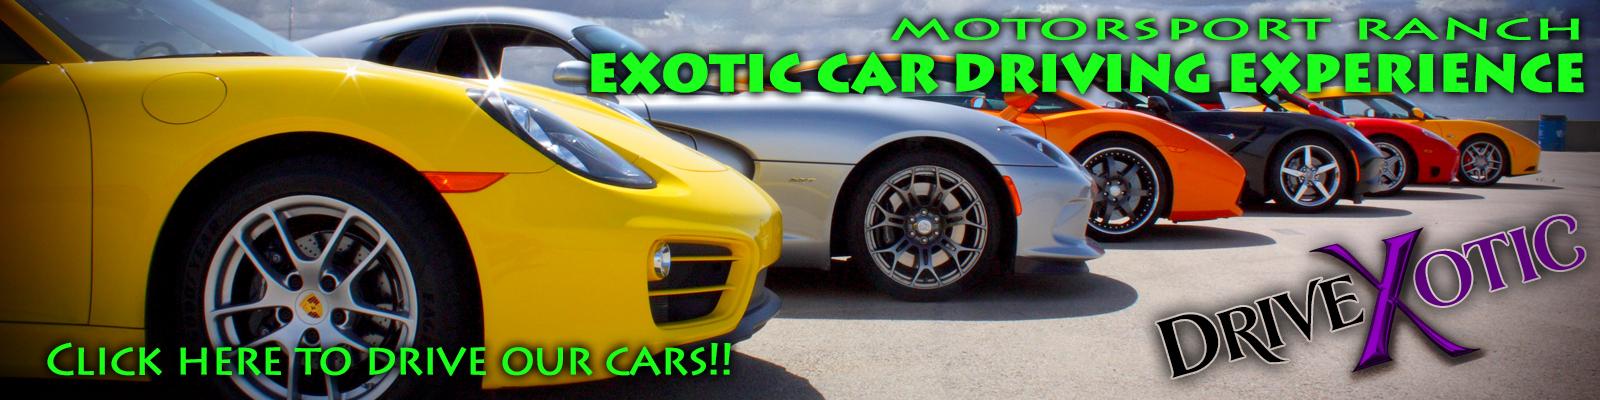 DriveXotic